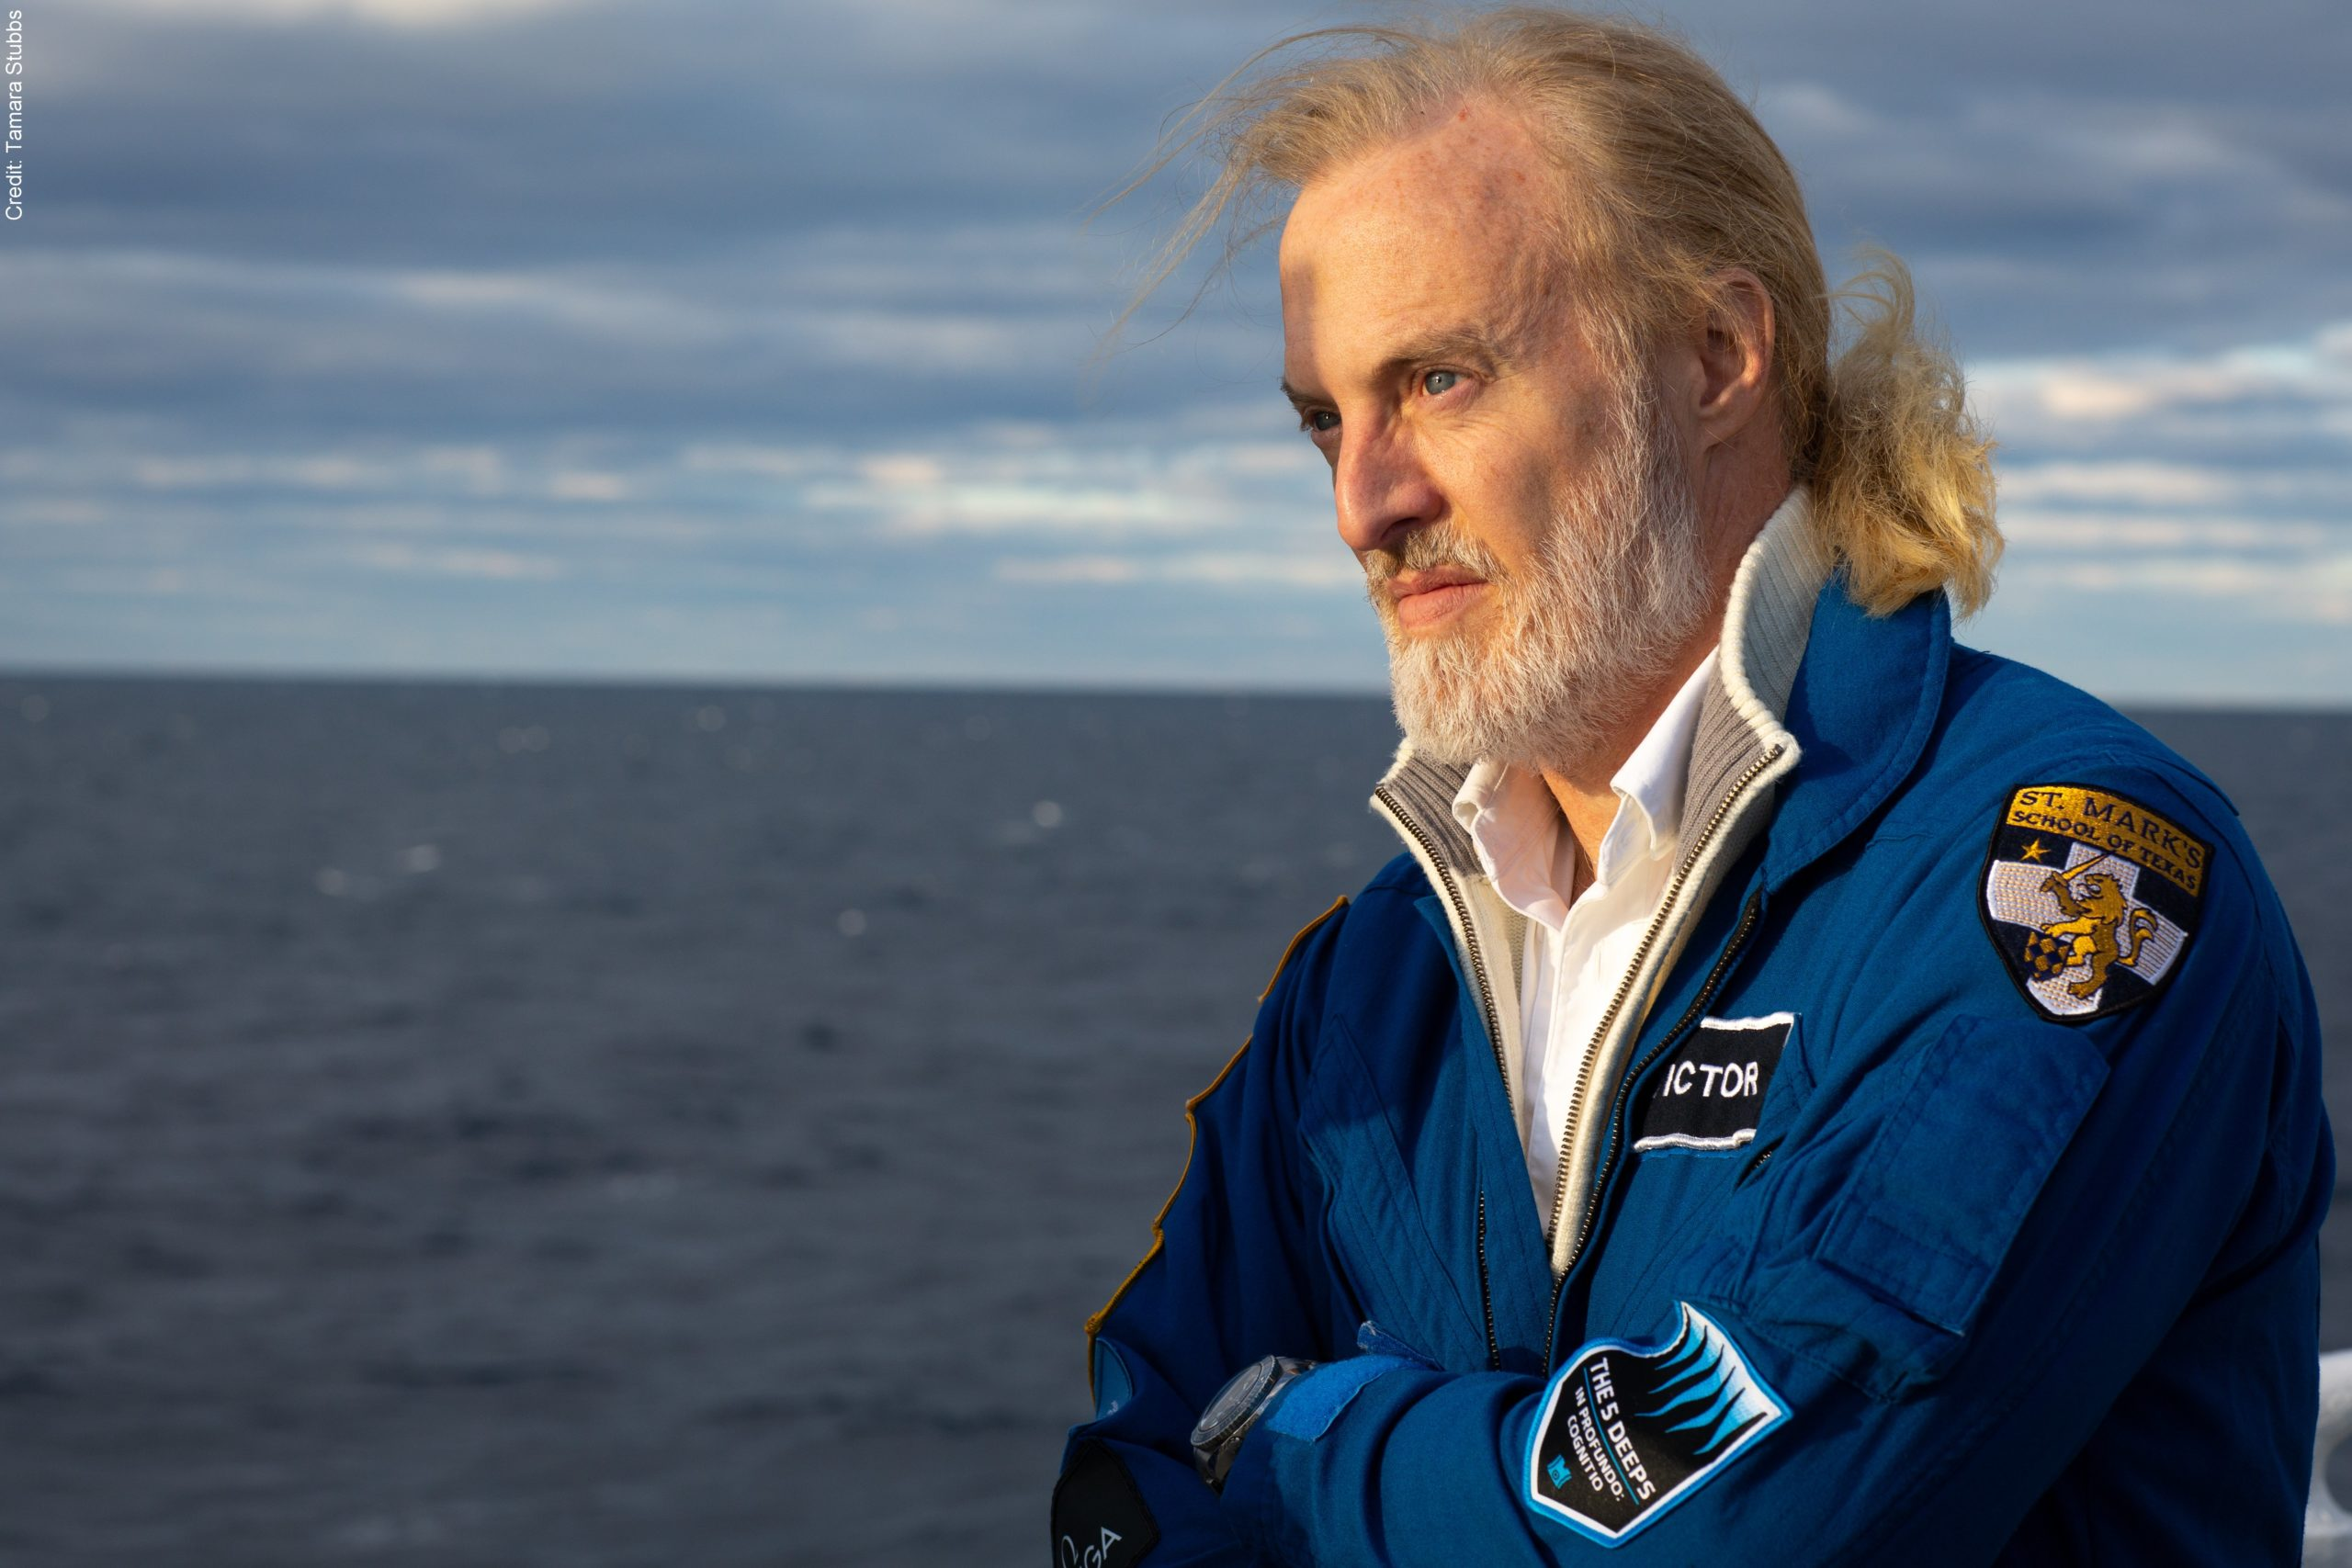 Headshot photograph of Victor Vescovo of Caladan Oceanic